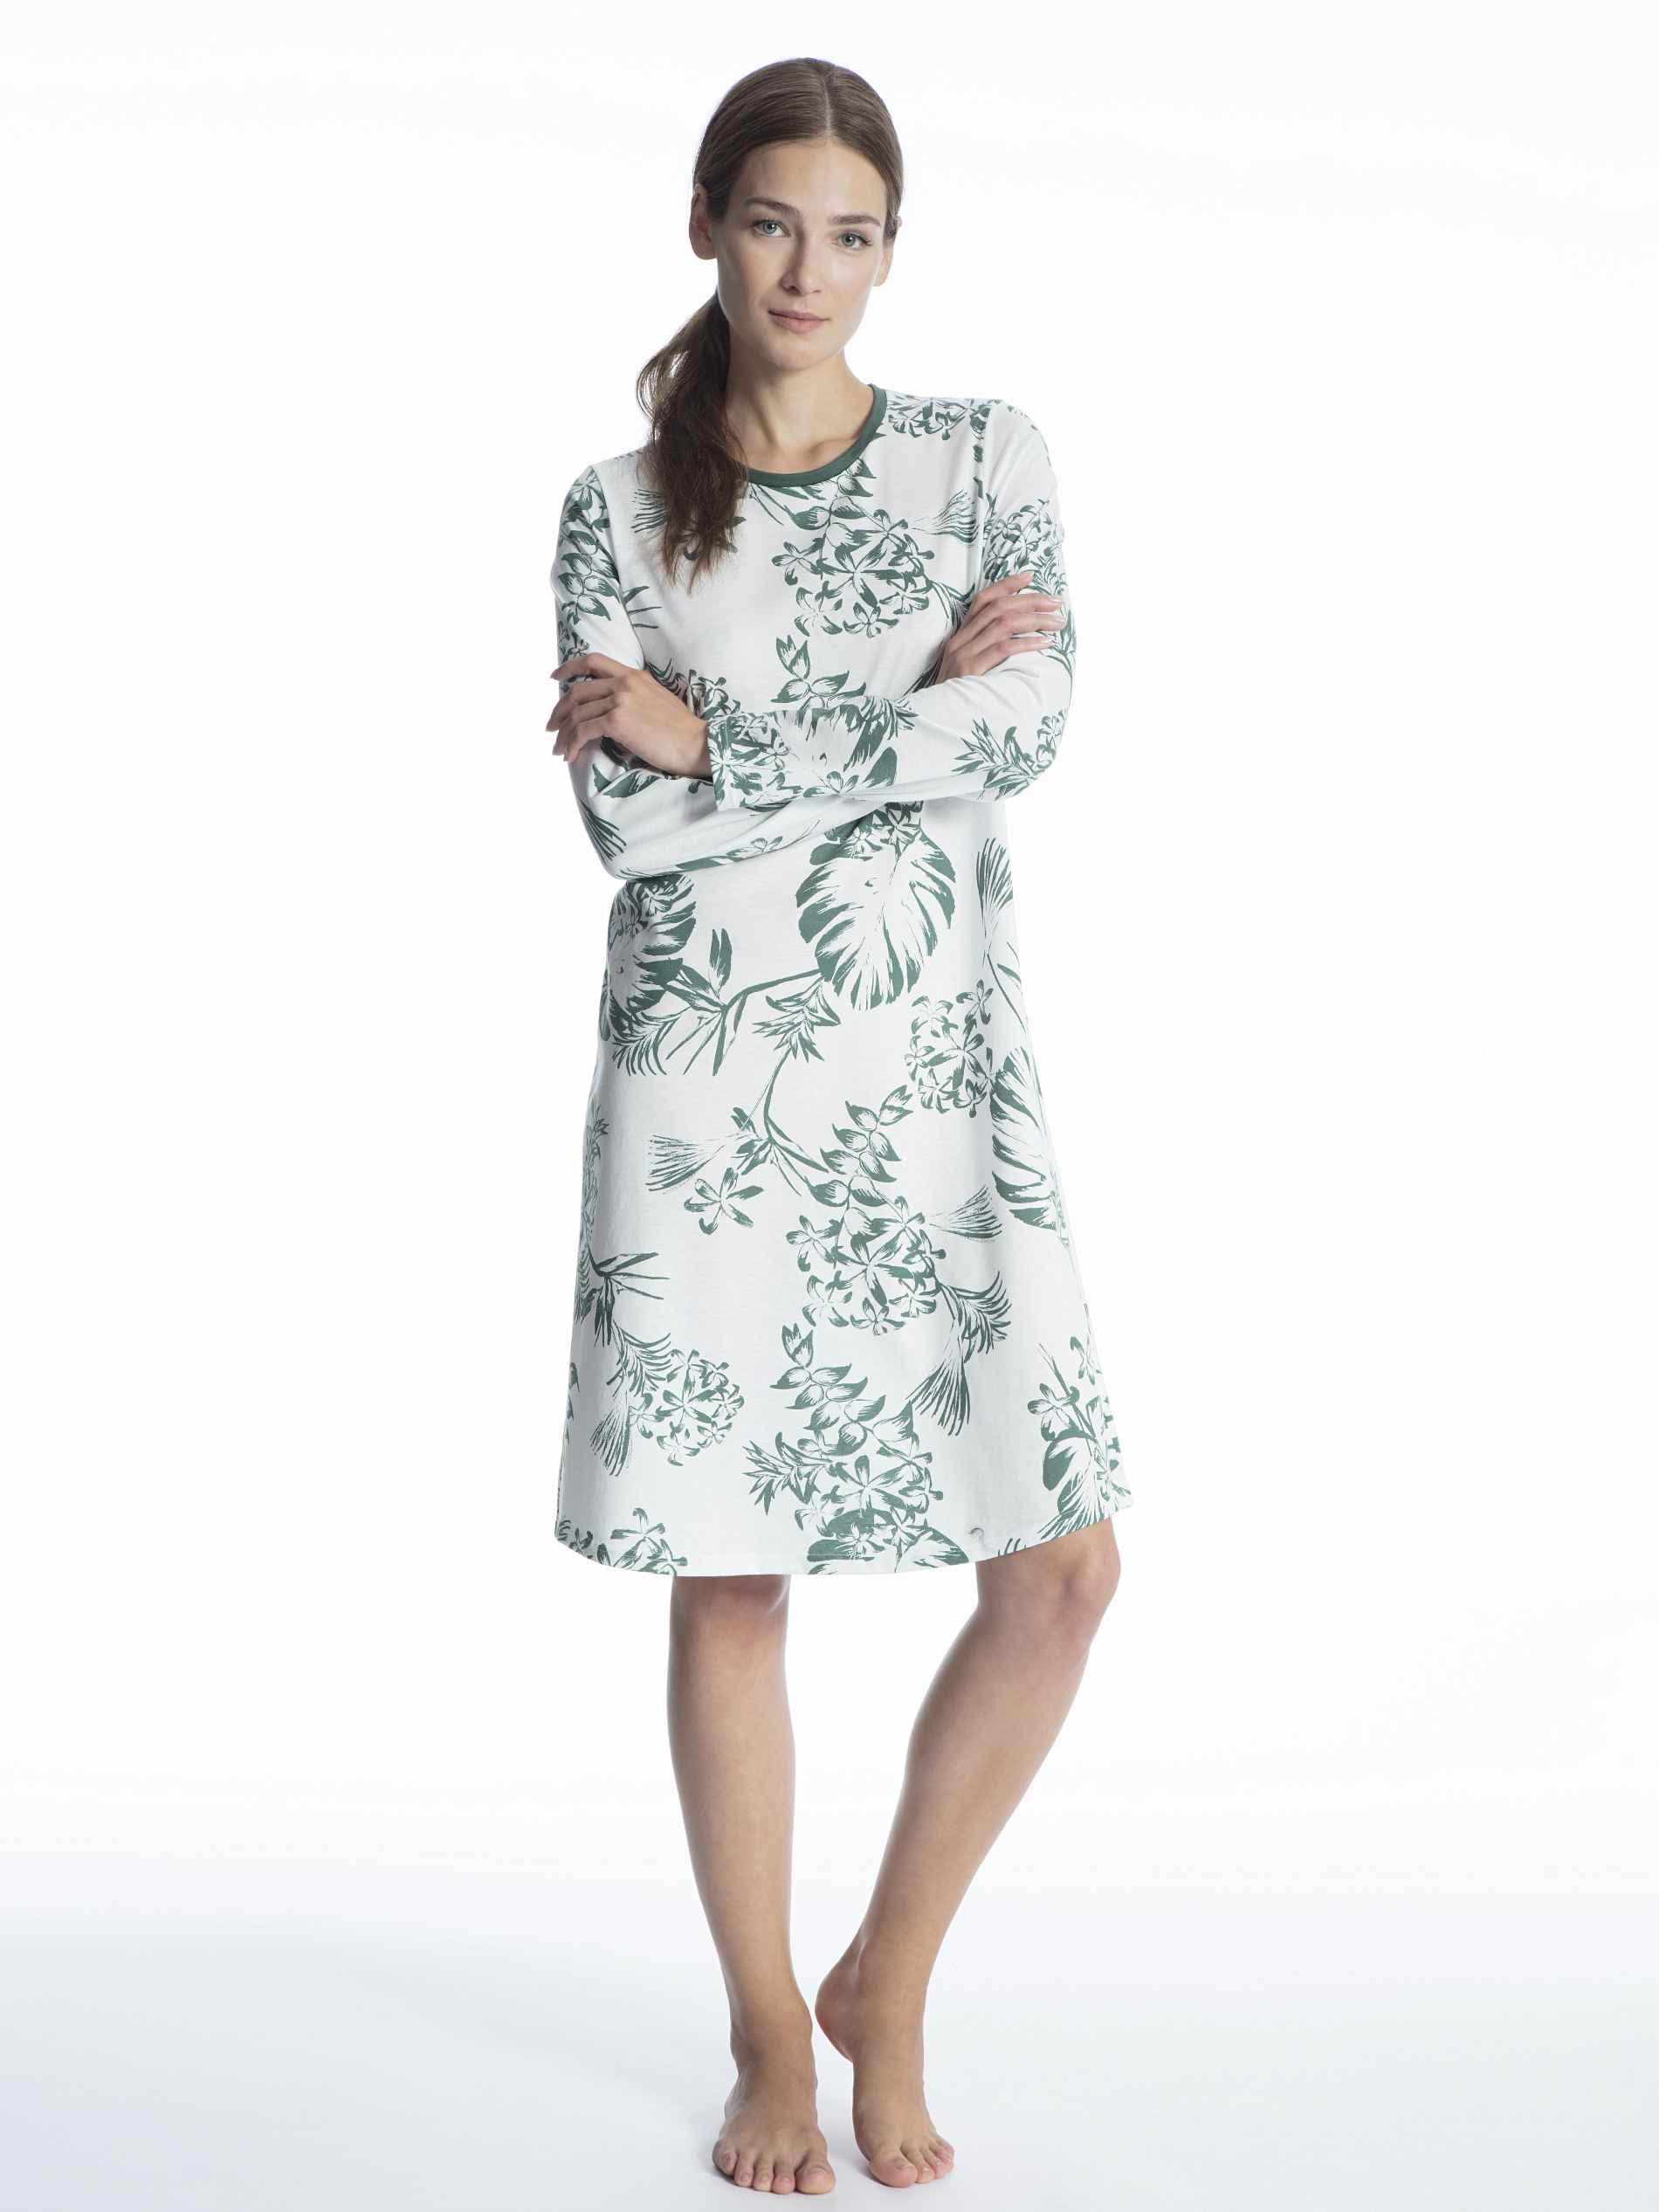 Damen CALIDA Soft Jersey Fun Nachtkleid Länge 100cm grün | 07613381081884